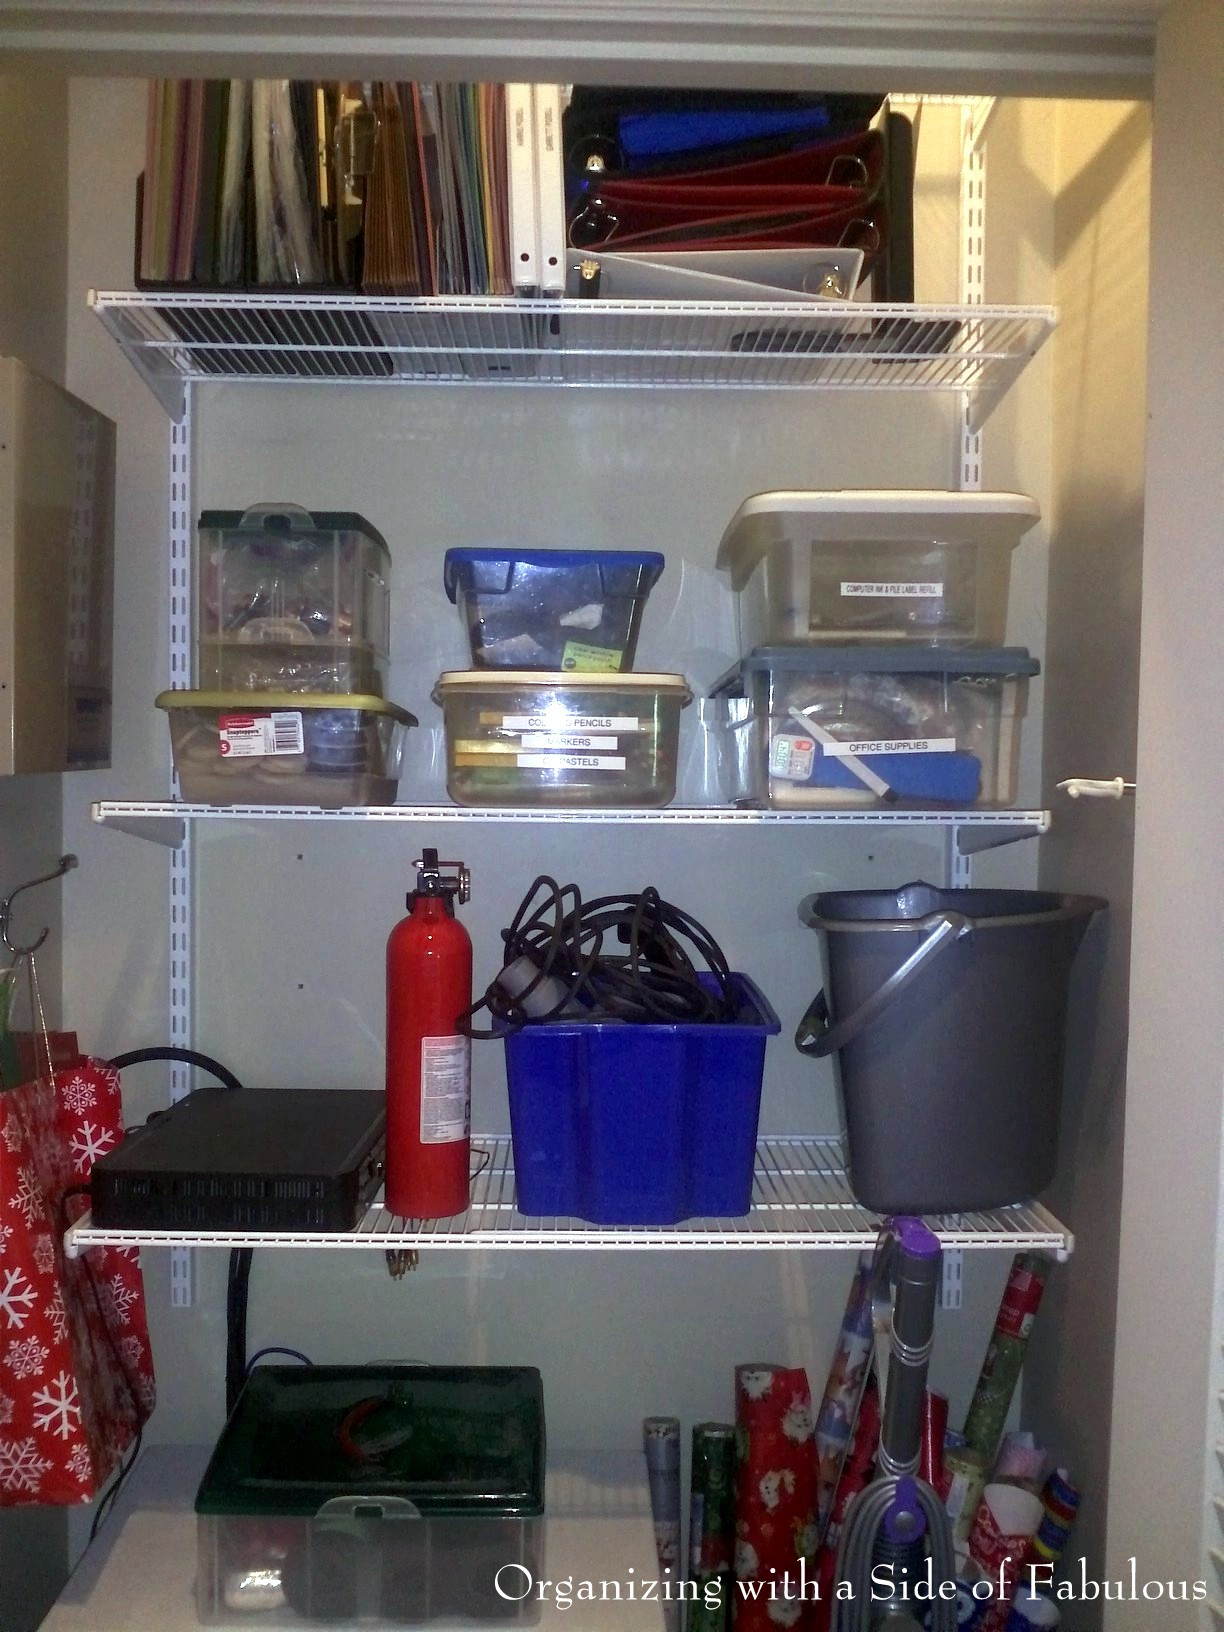 Supply Closet After